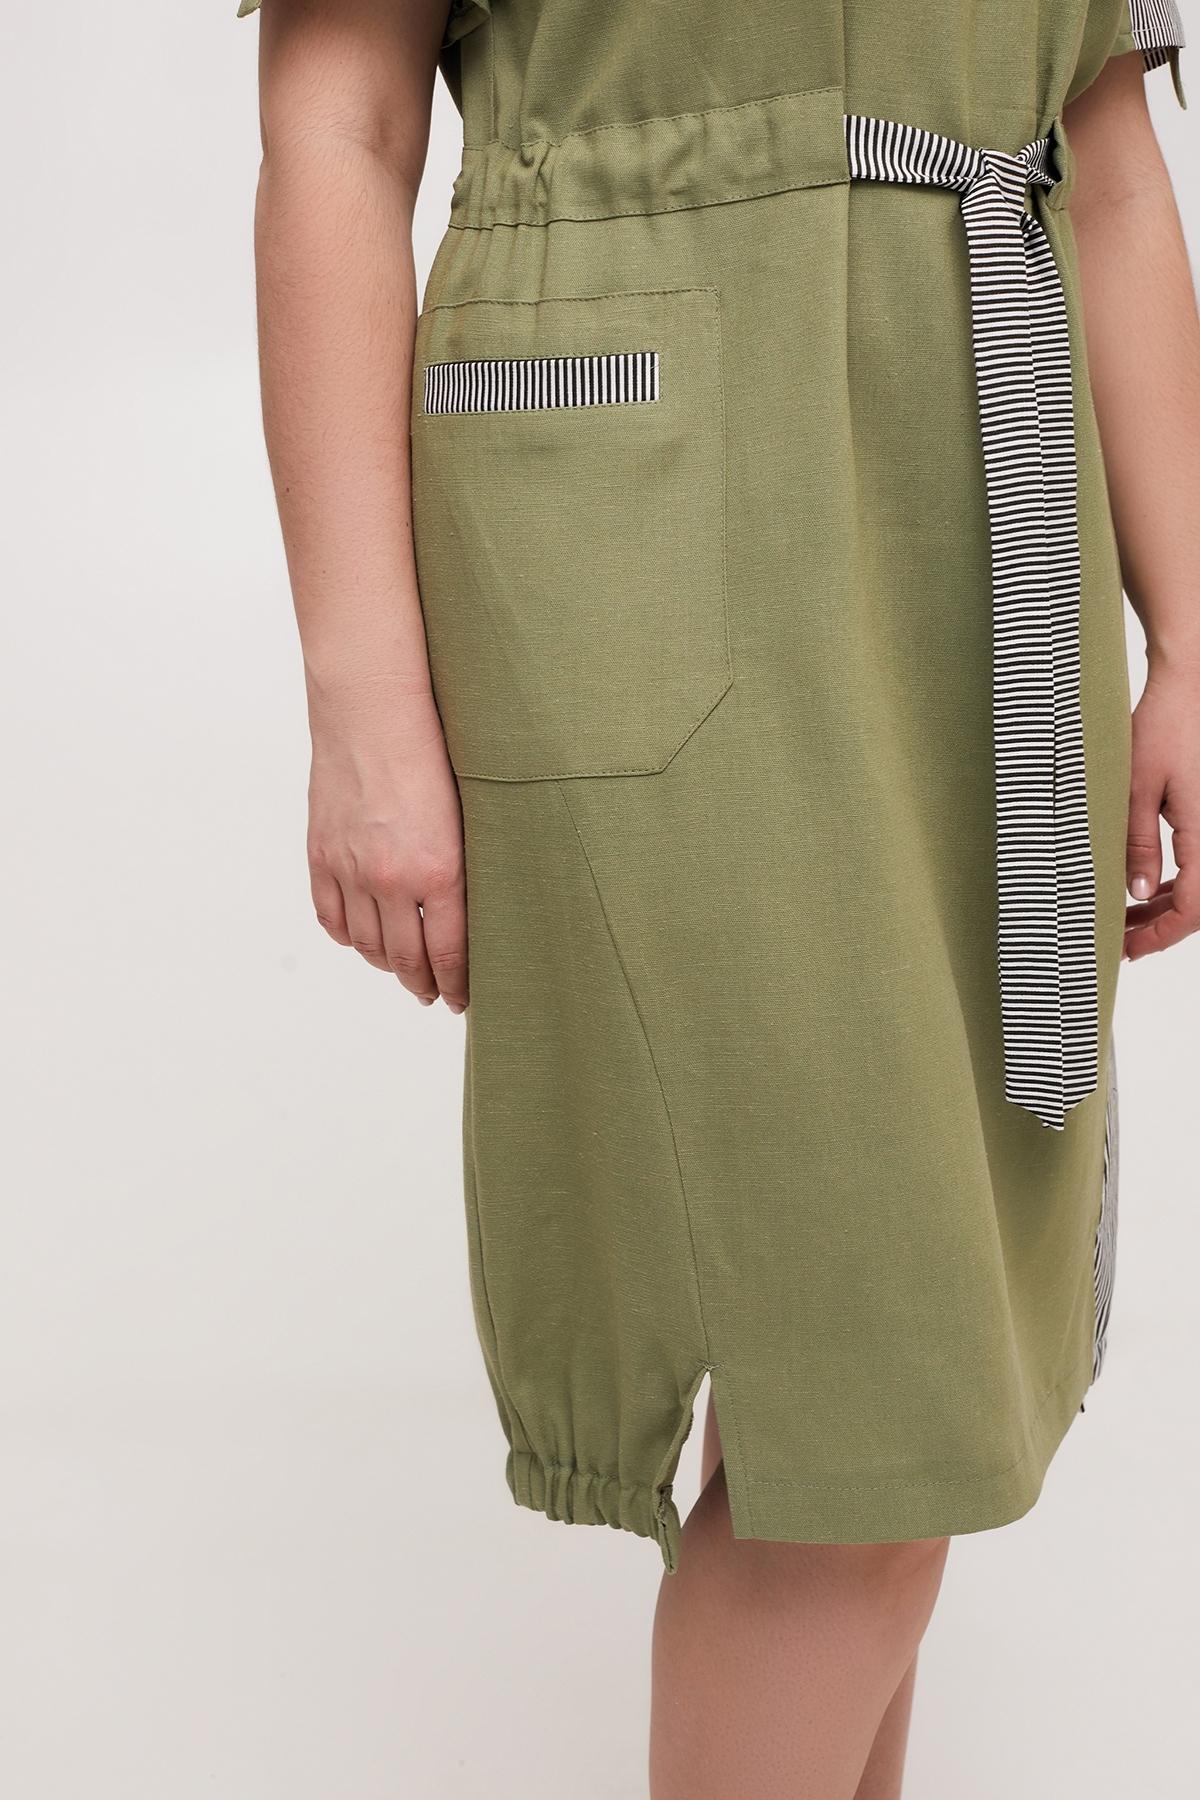 Сукня Земфіра (Земфира) (оливковий)